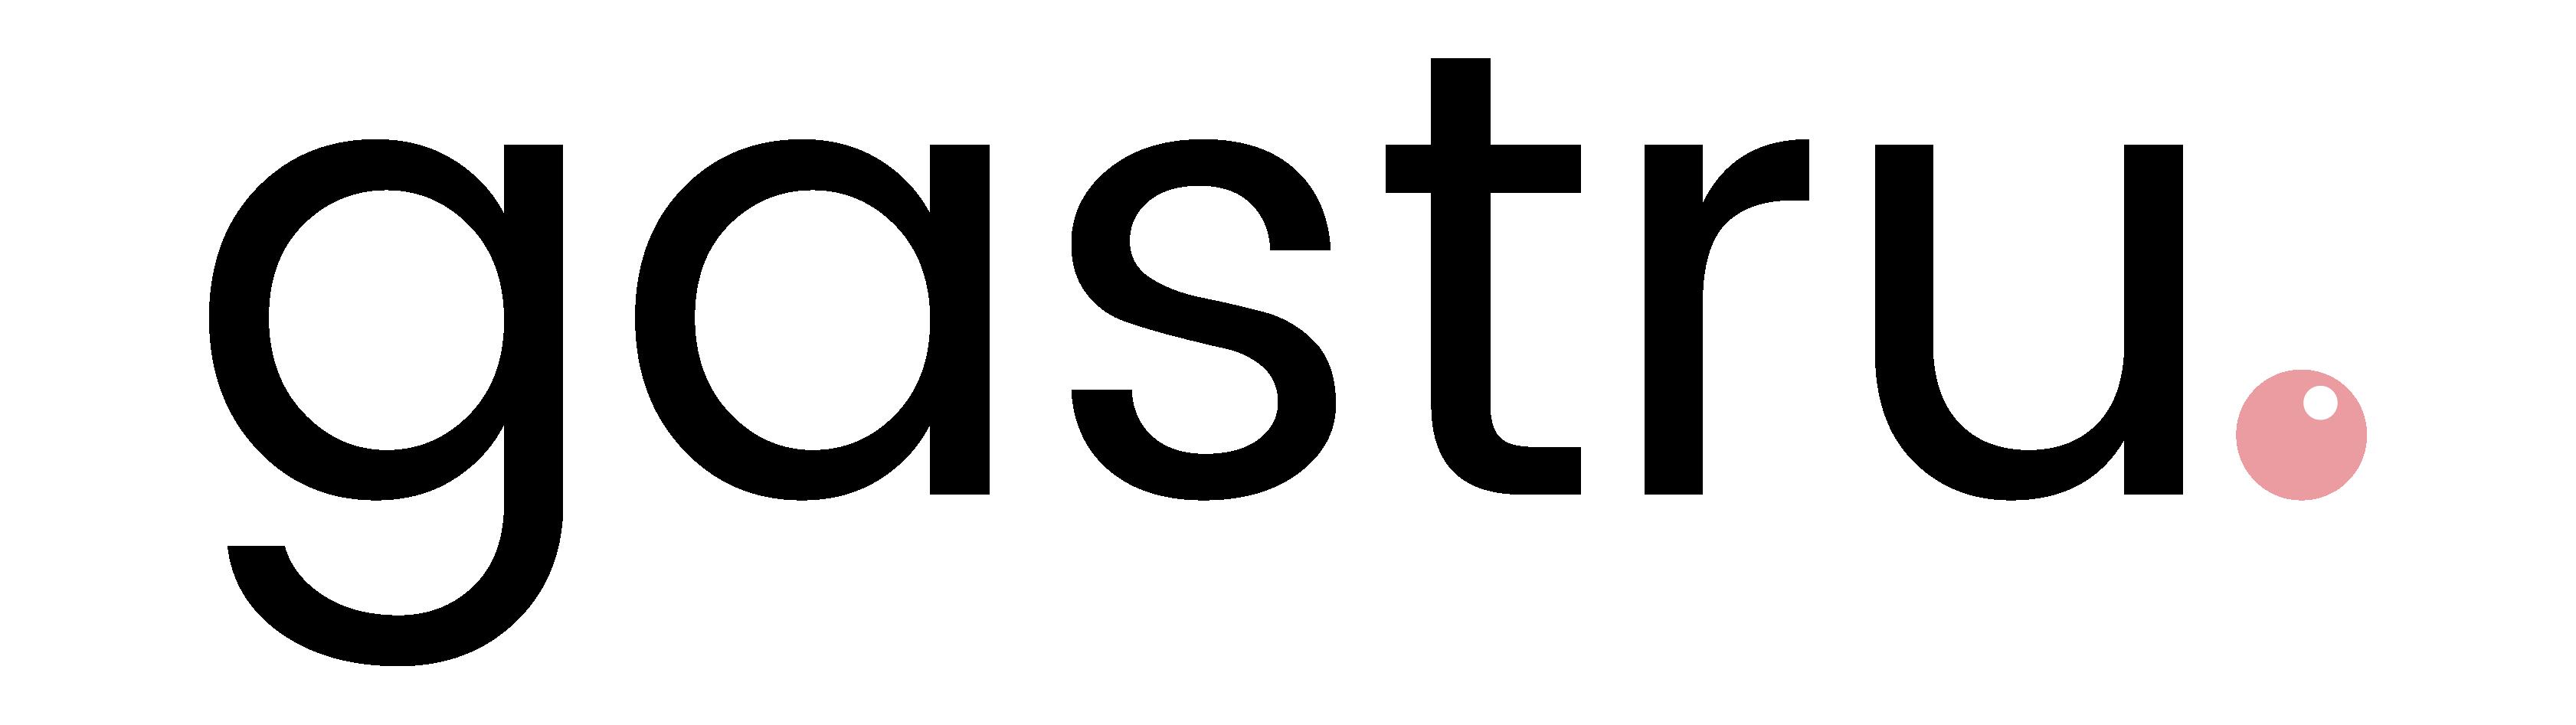 Gastru